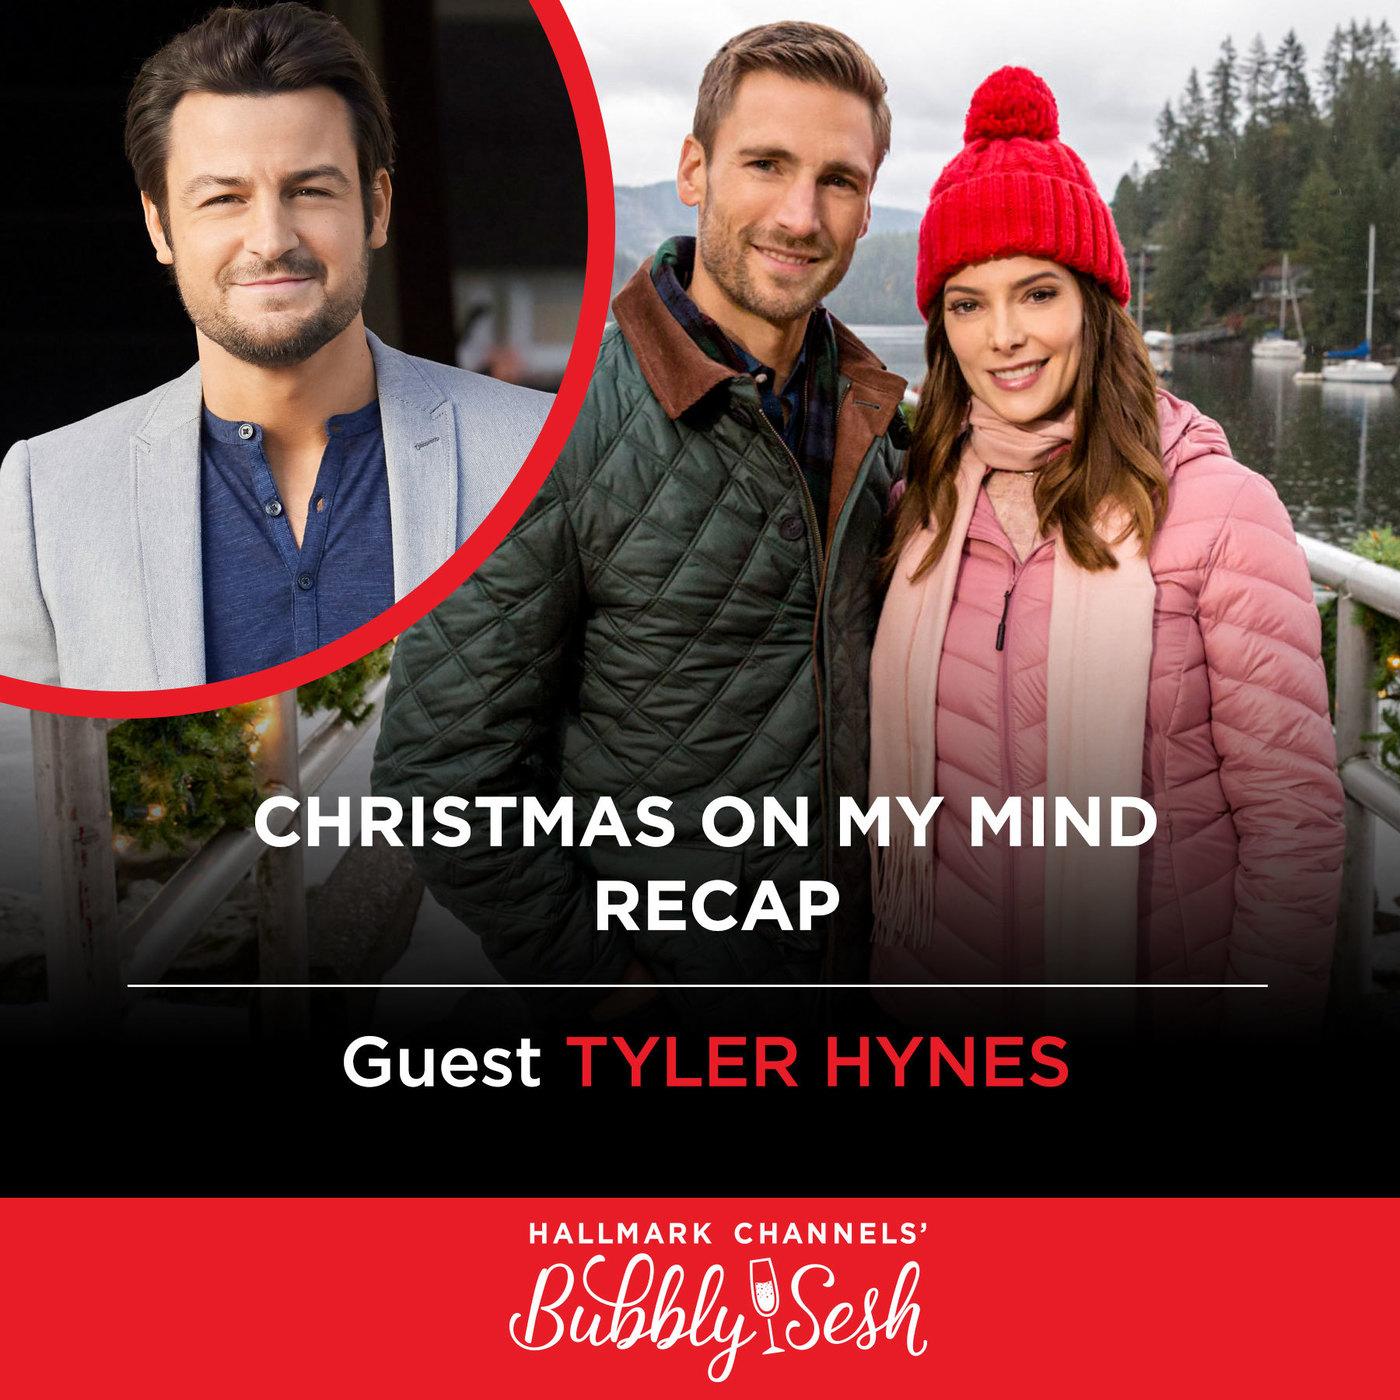 Christmas on My Mind Recap with Tyler Hynes